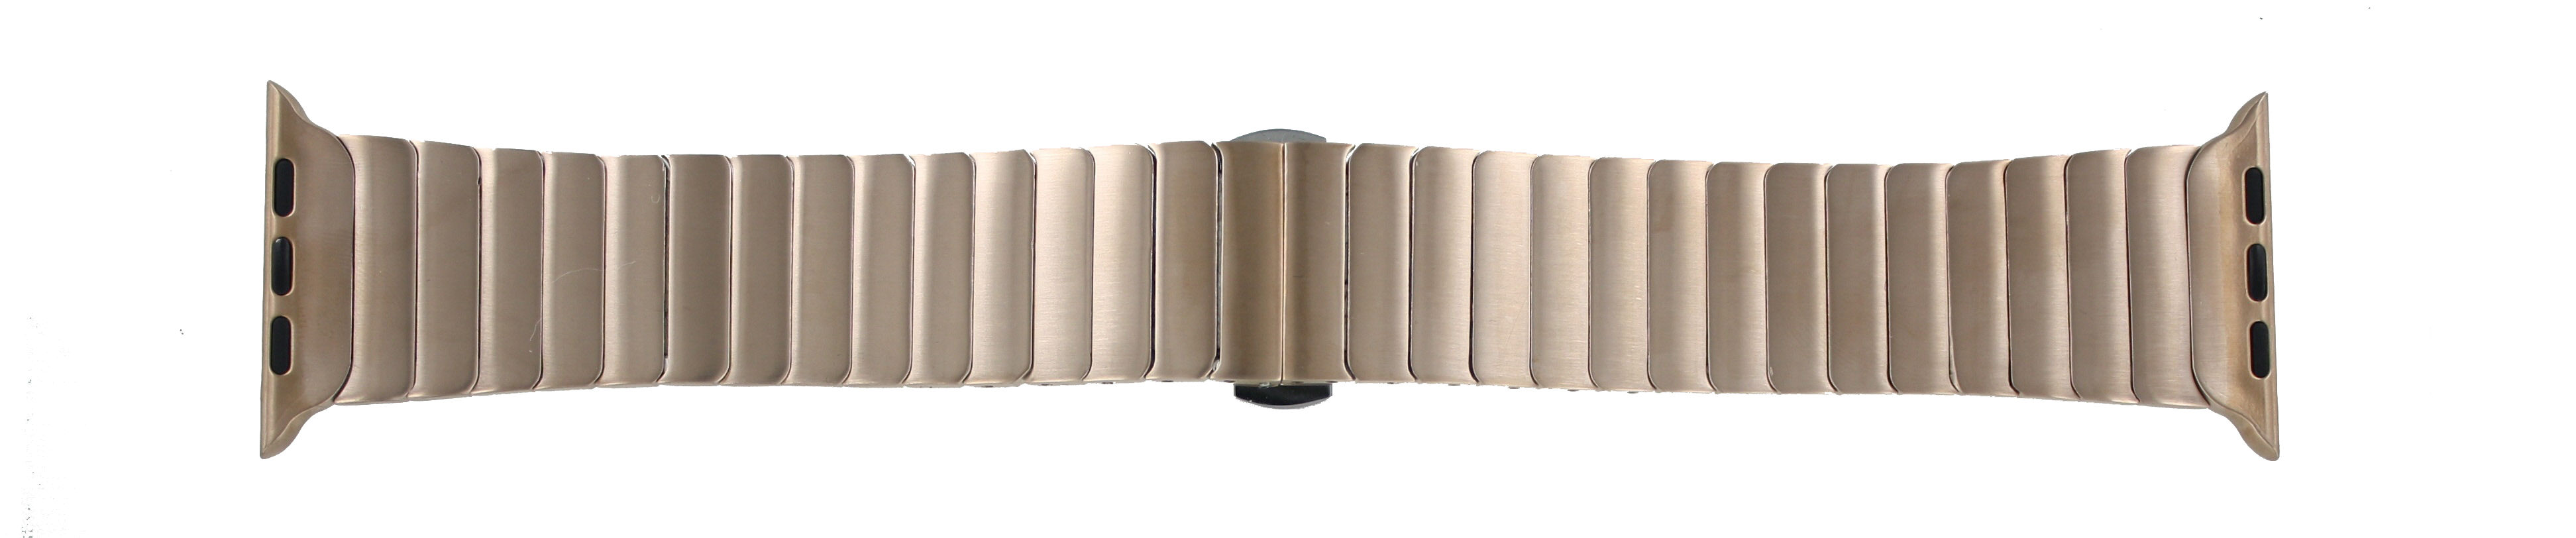 Apple (replacement model) klockarmband LS-AB-107 Stål Guld (Rosé) 42mm